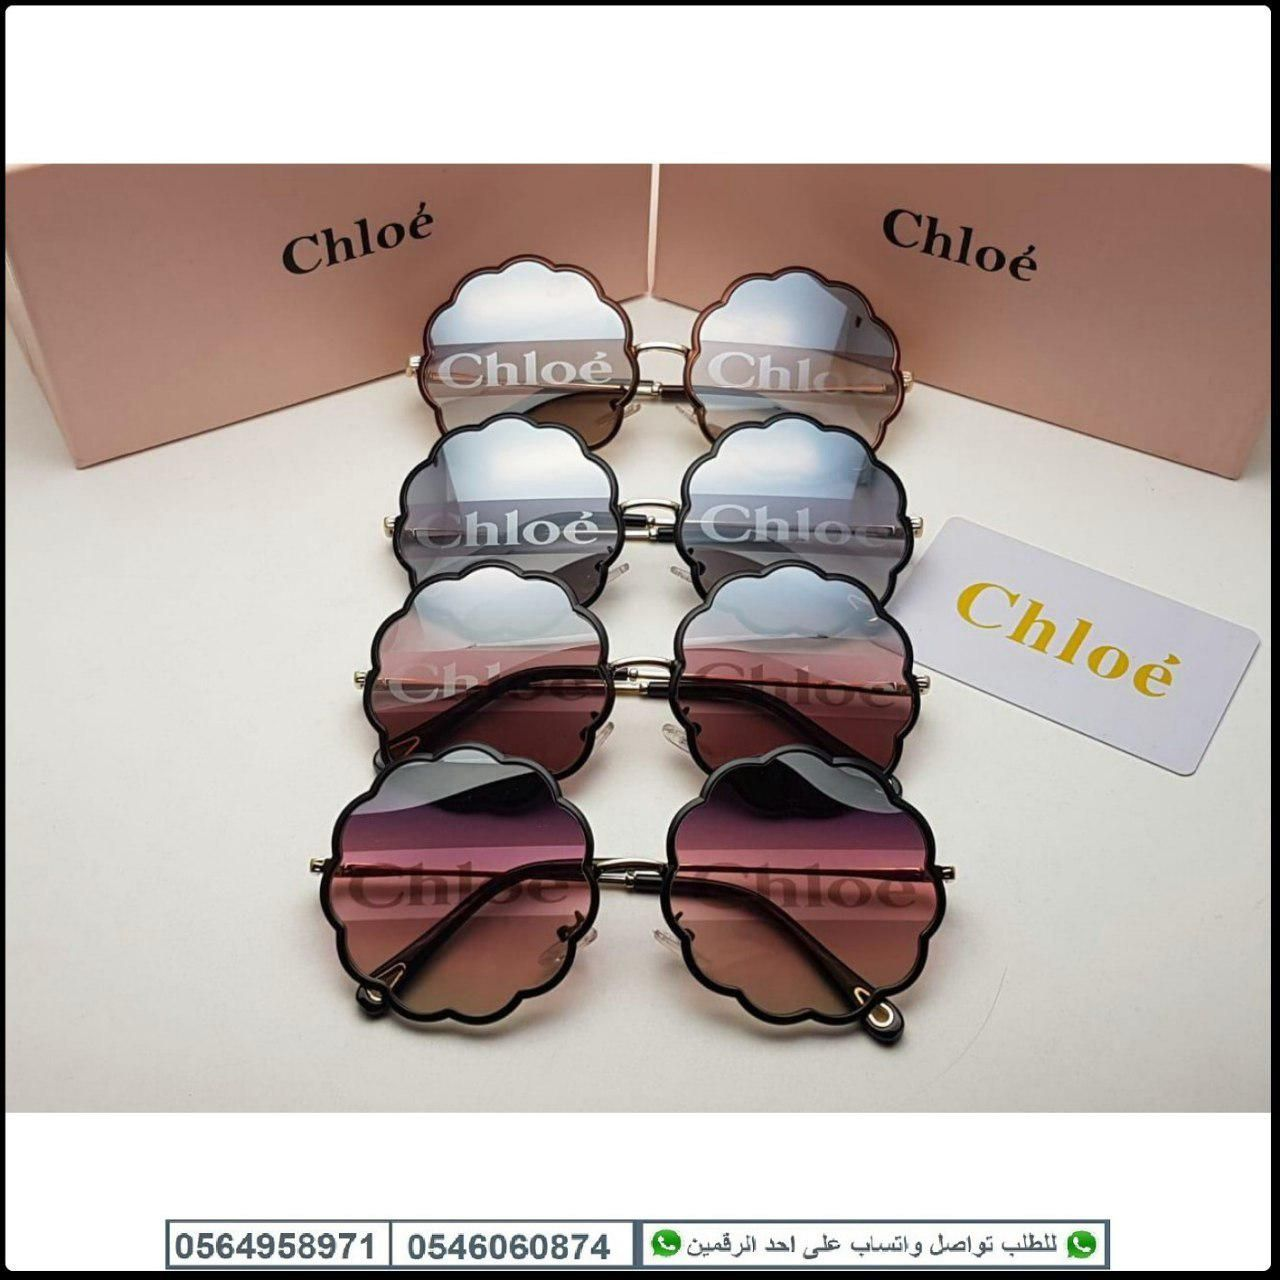 نظارات كلوي نسائي مع كامل ملحقاتها و بنفس اسم الماركه هدايا هنوف Sunglasses Glasses